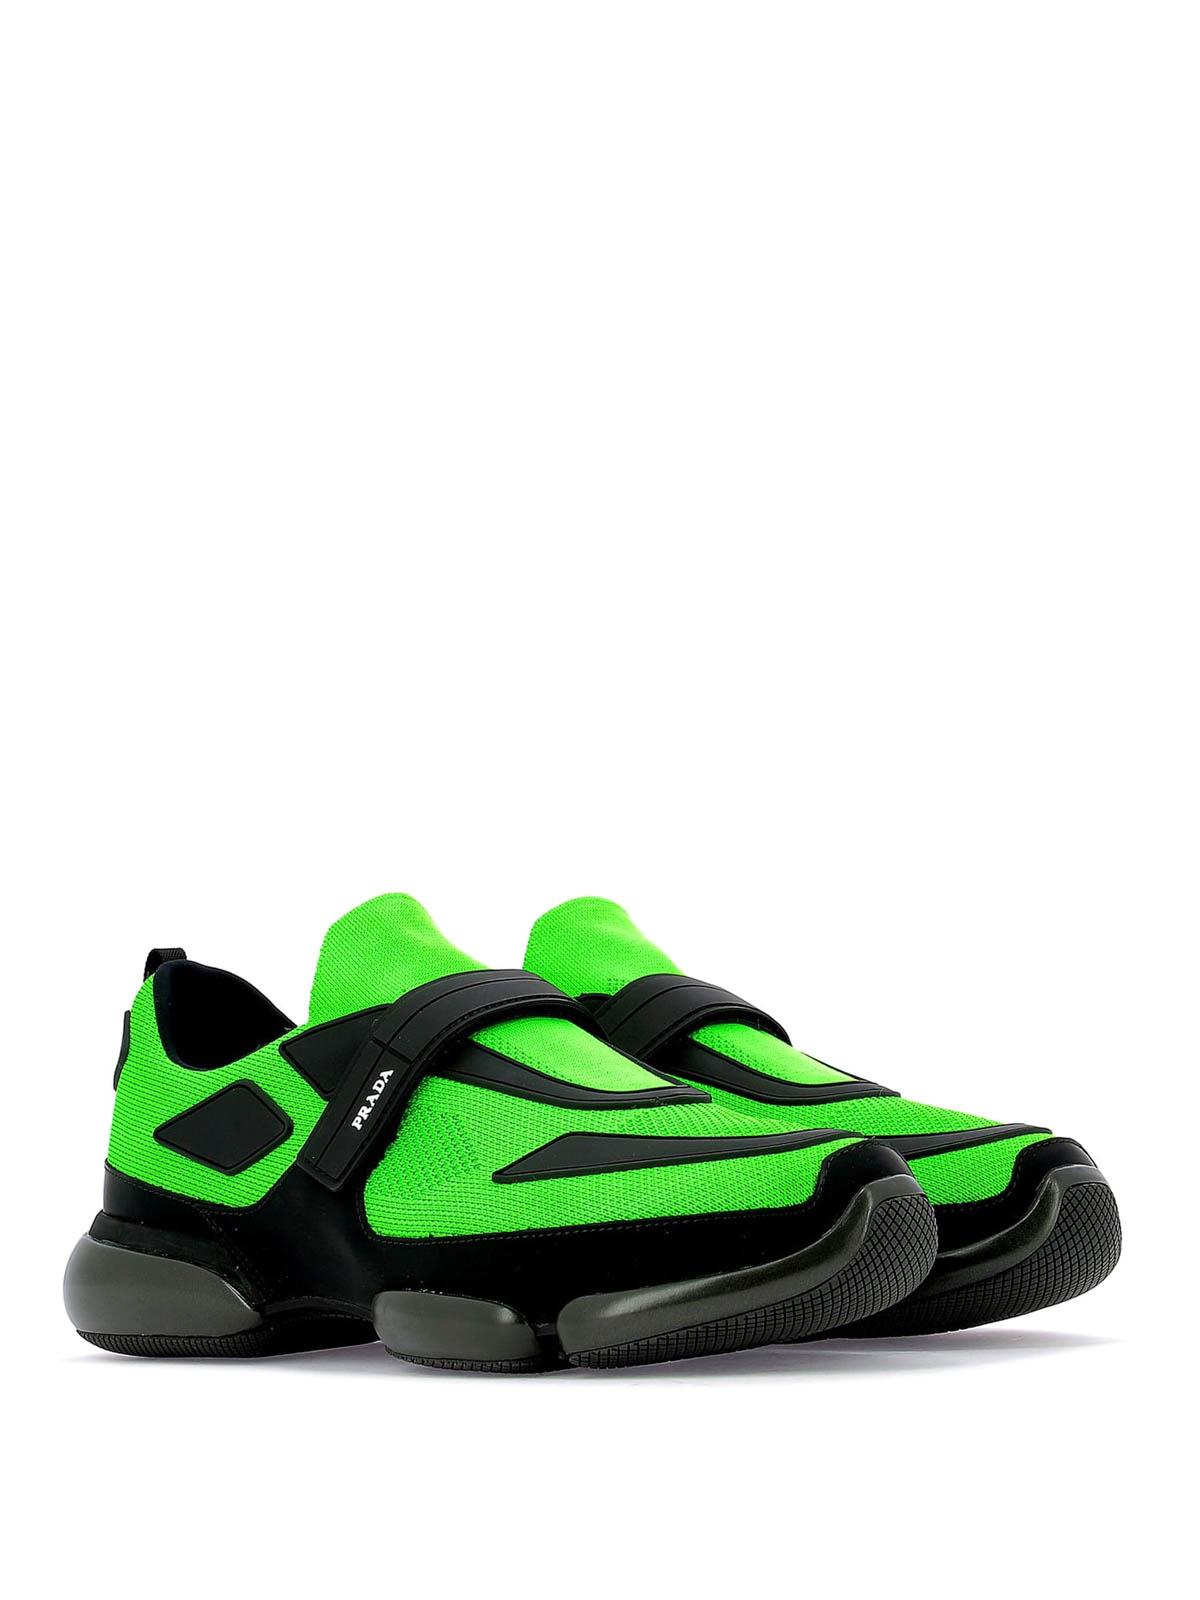 Prada - Cloudbust green and black